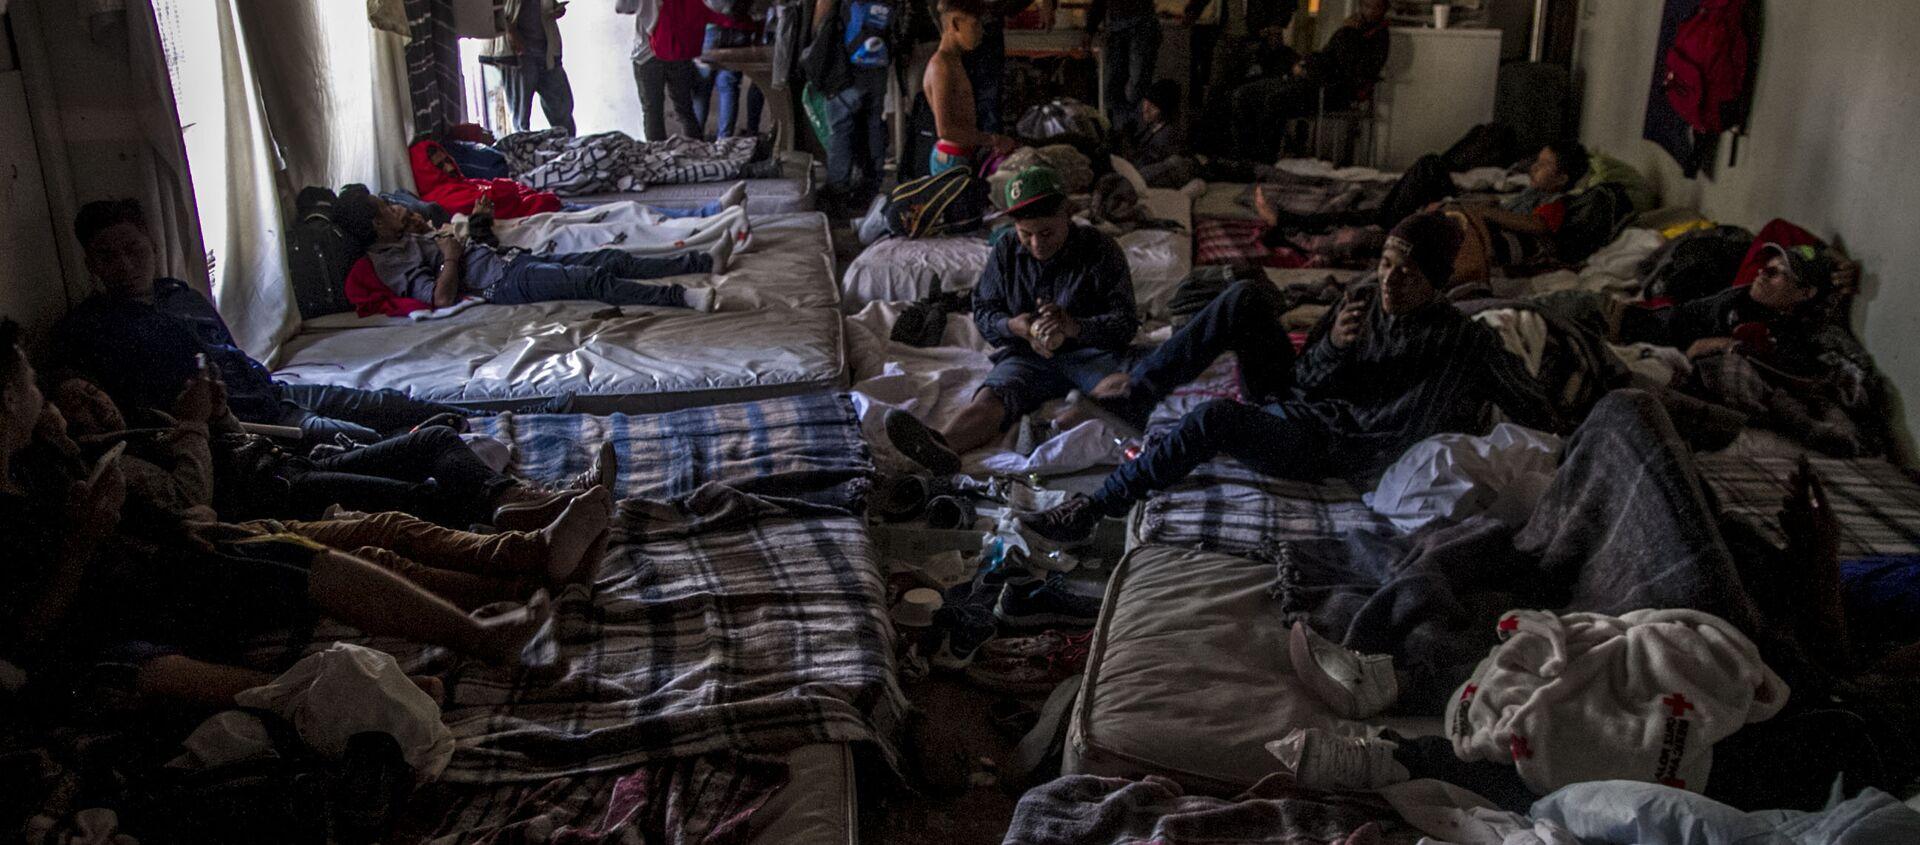 Hospedaje de hombres jóvenes de la caravana migrante en Tijuana, Baja California, México - Sputnik Mundo, 1920, 18.01.2021